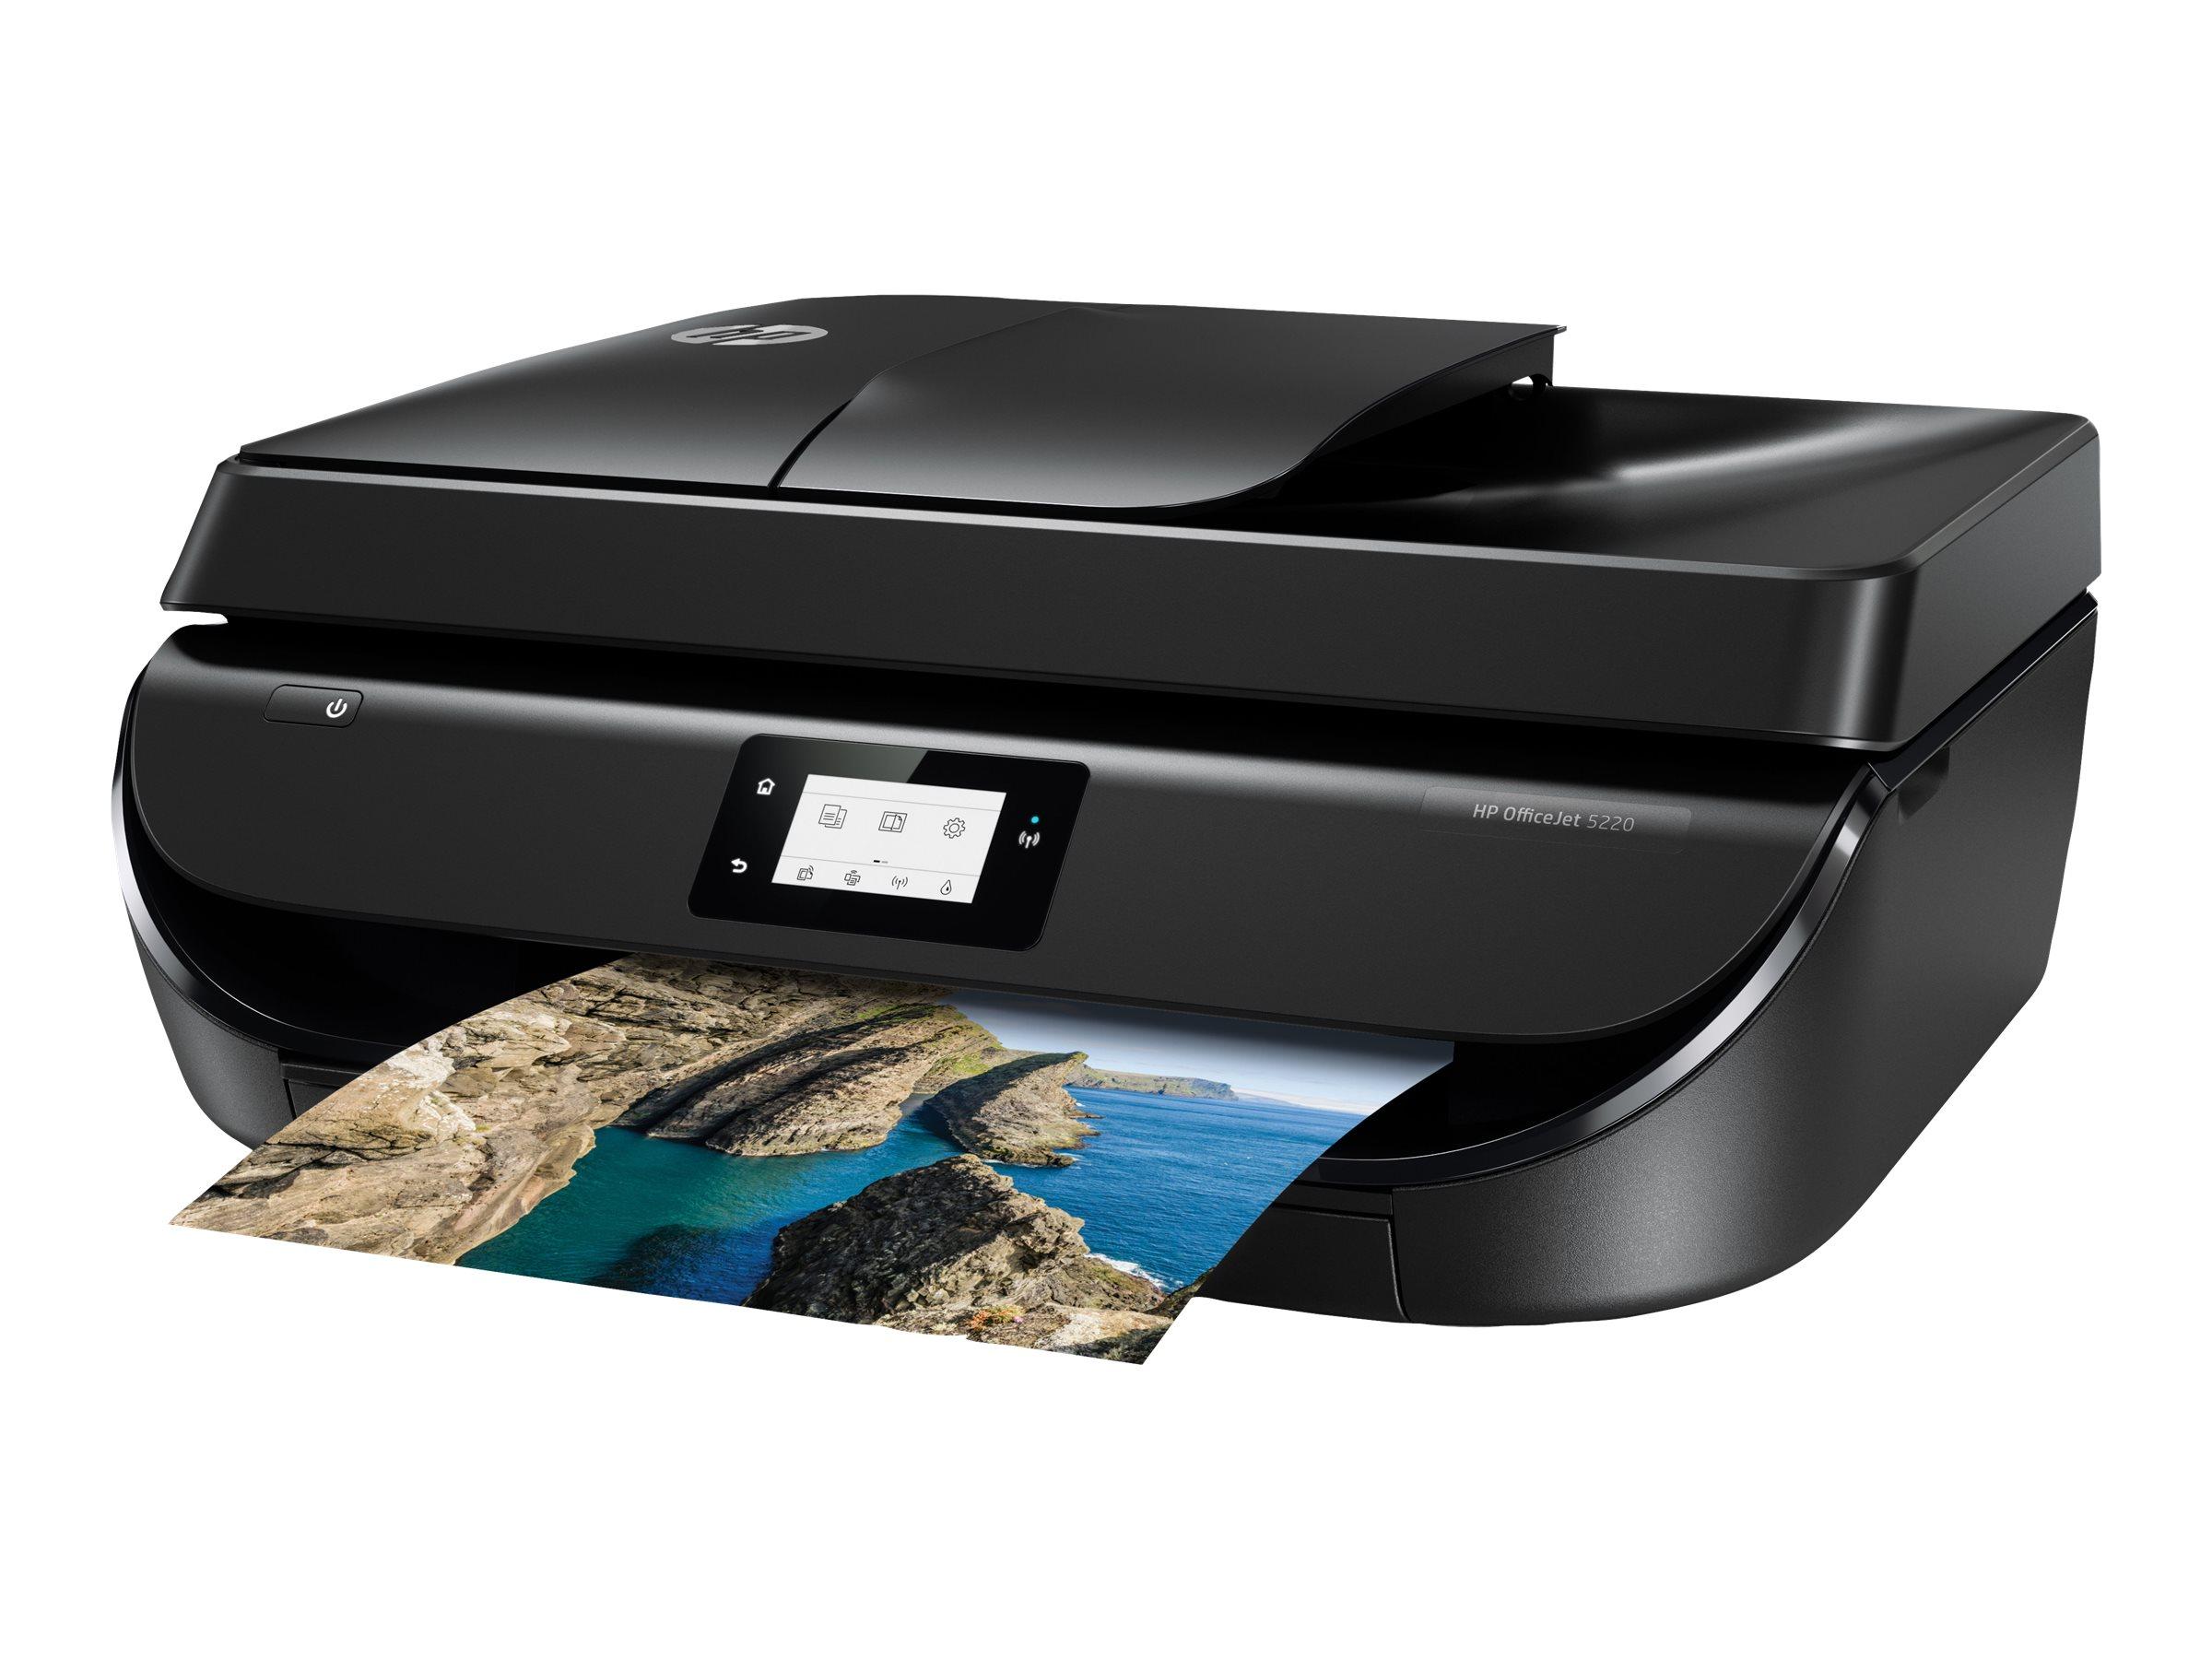 HP Officejet 5220 All-in-One - Multifunktionsdrucker - Farbe - Tintenstrahl - 216 x 297 mm (Original) - A4/Legal (Medien)